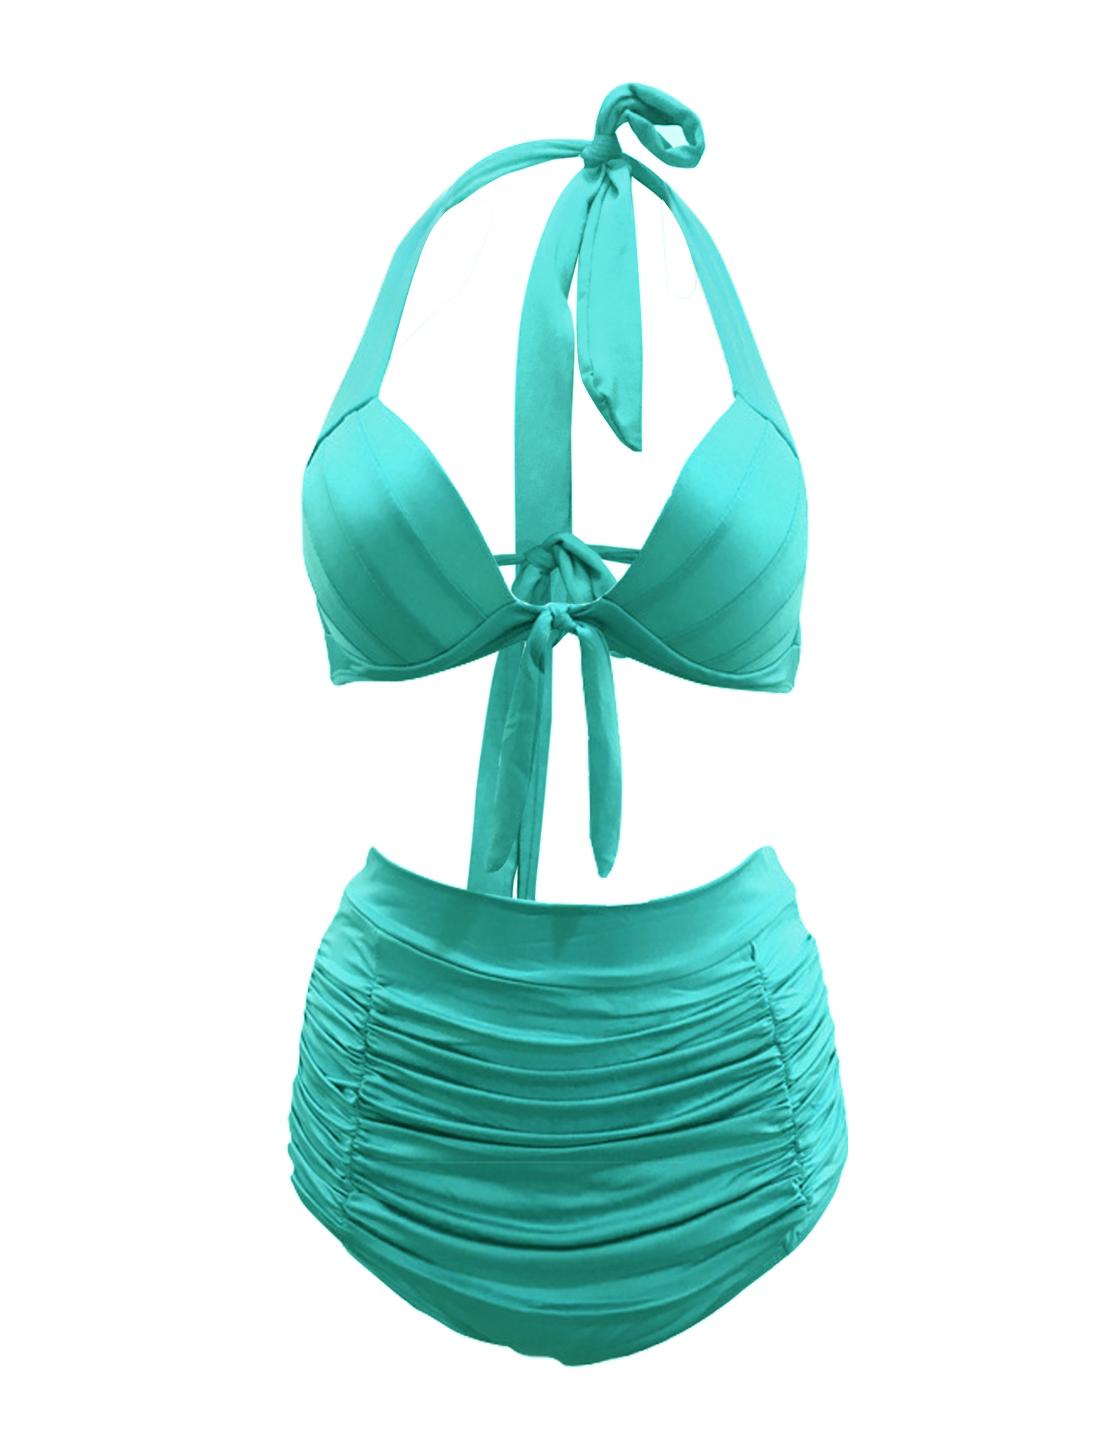 Women 50s Halter High Waist Bikini Vintage Swimsuit Bathing Suit Peacock Blue L